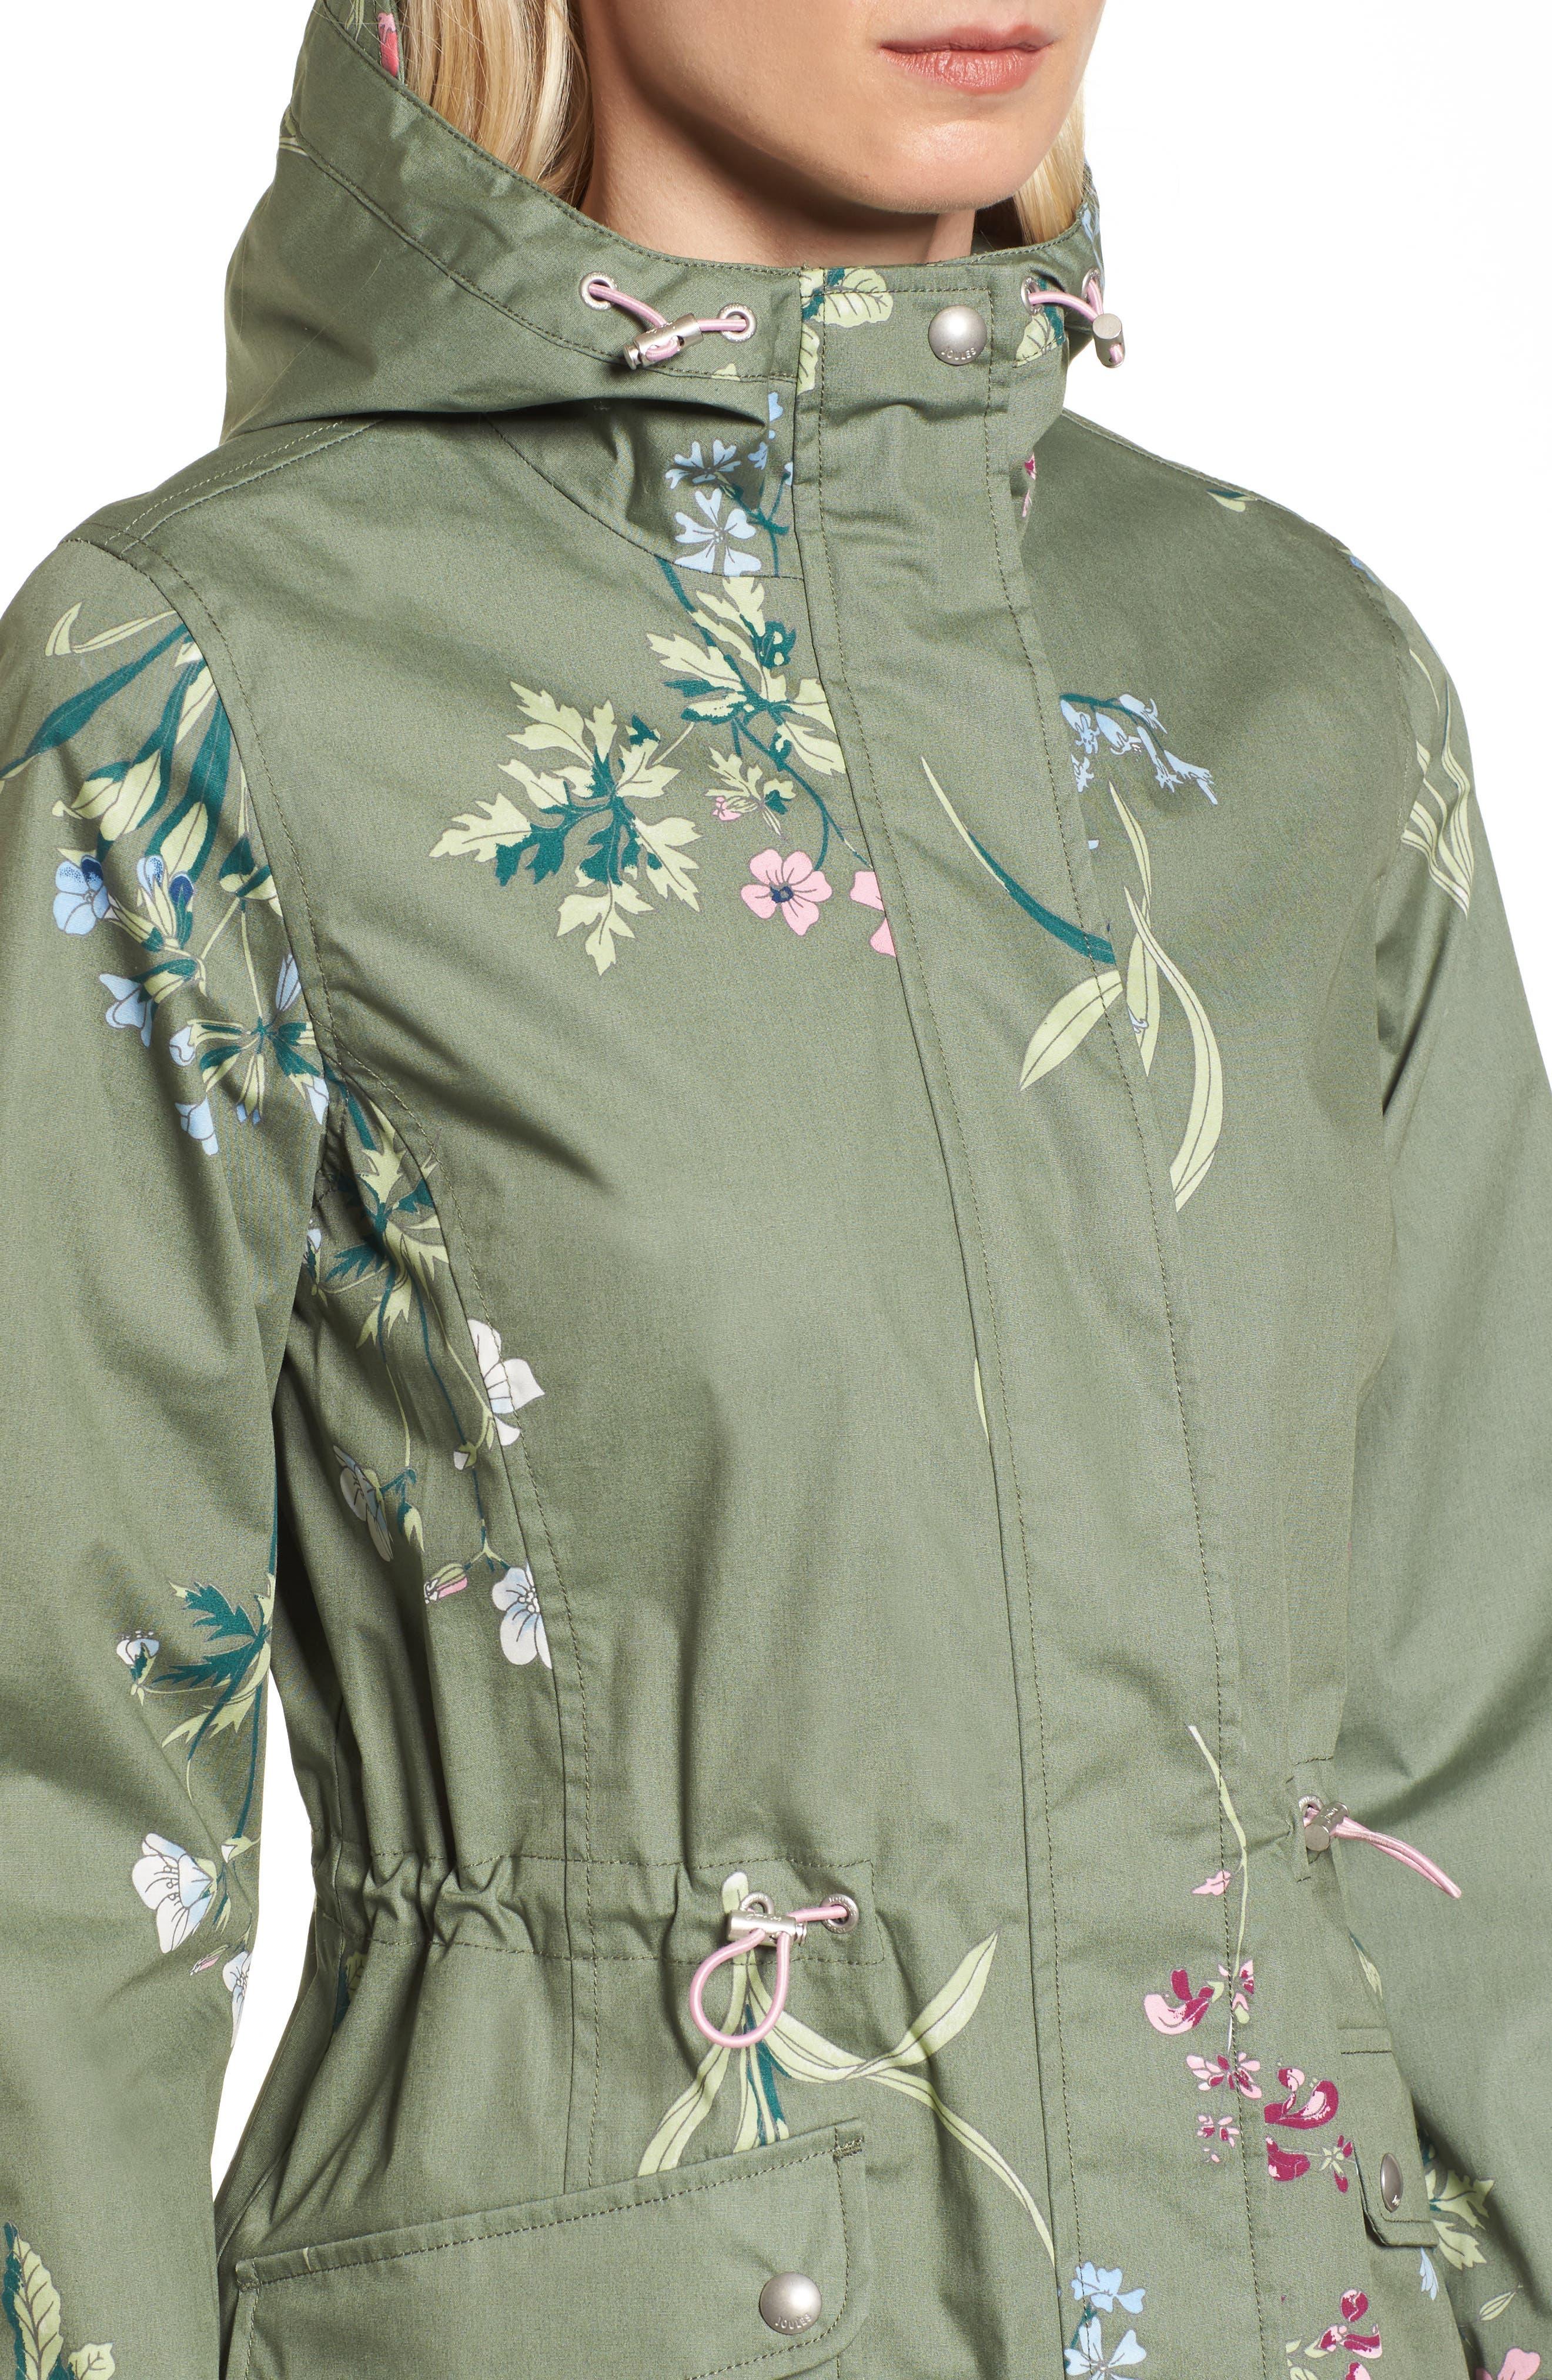 Right as Rain - Coastline Waterproof Cotton Jacket,                             Alternate thumbnail 4, color,                             Laurel Botanical